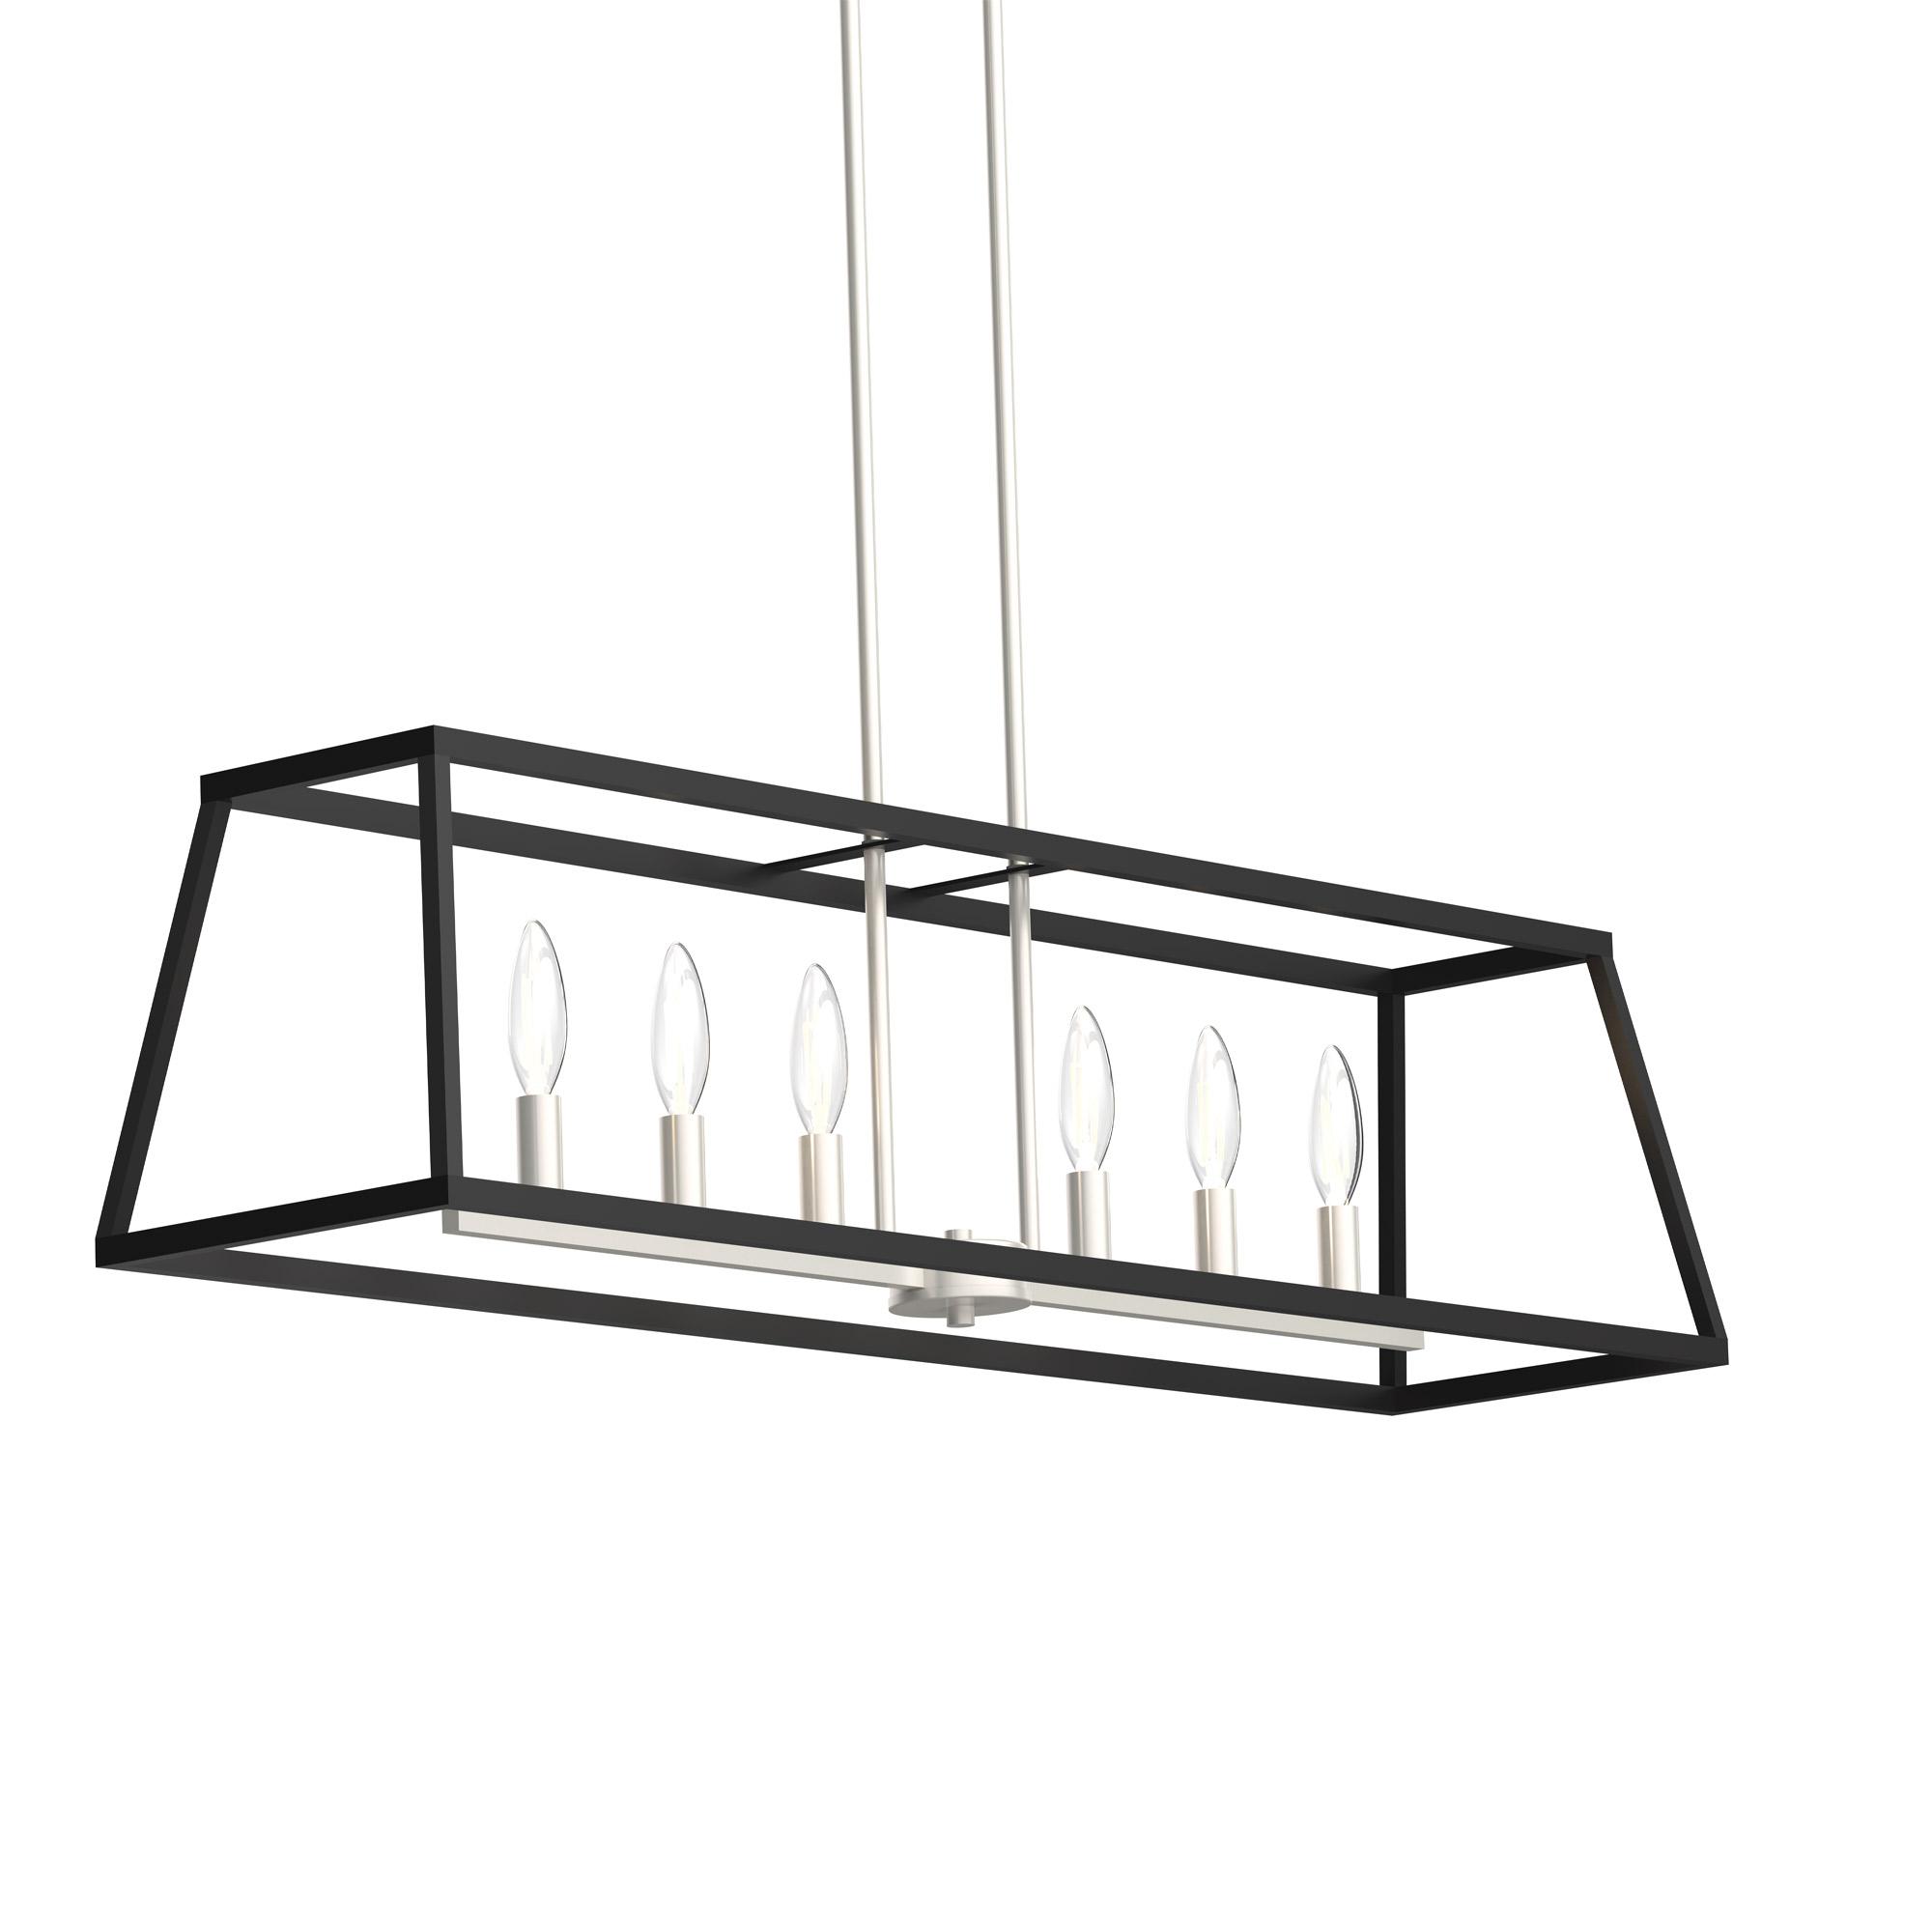 Lauian Linear Pendant By Dvi Lighting